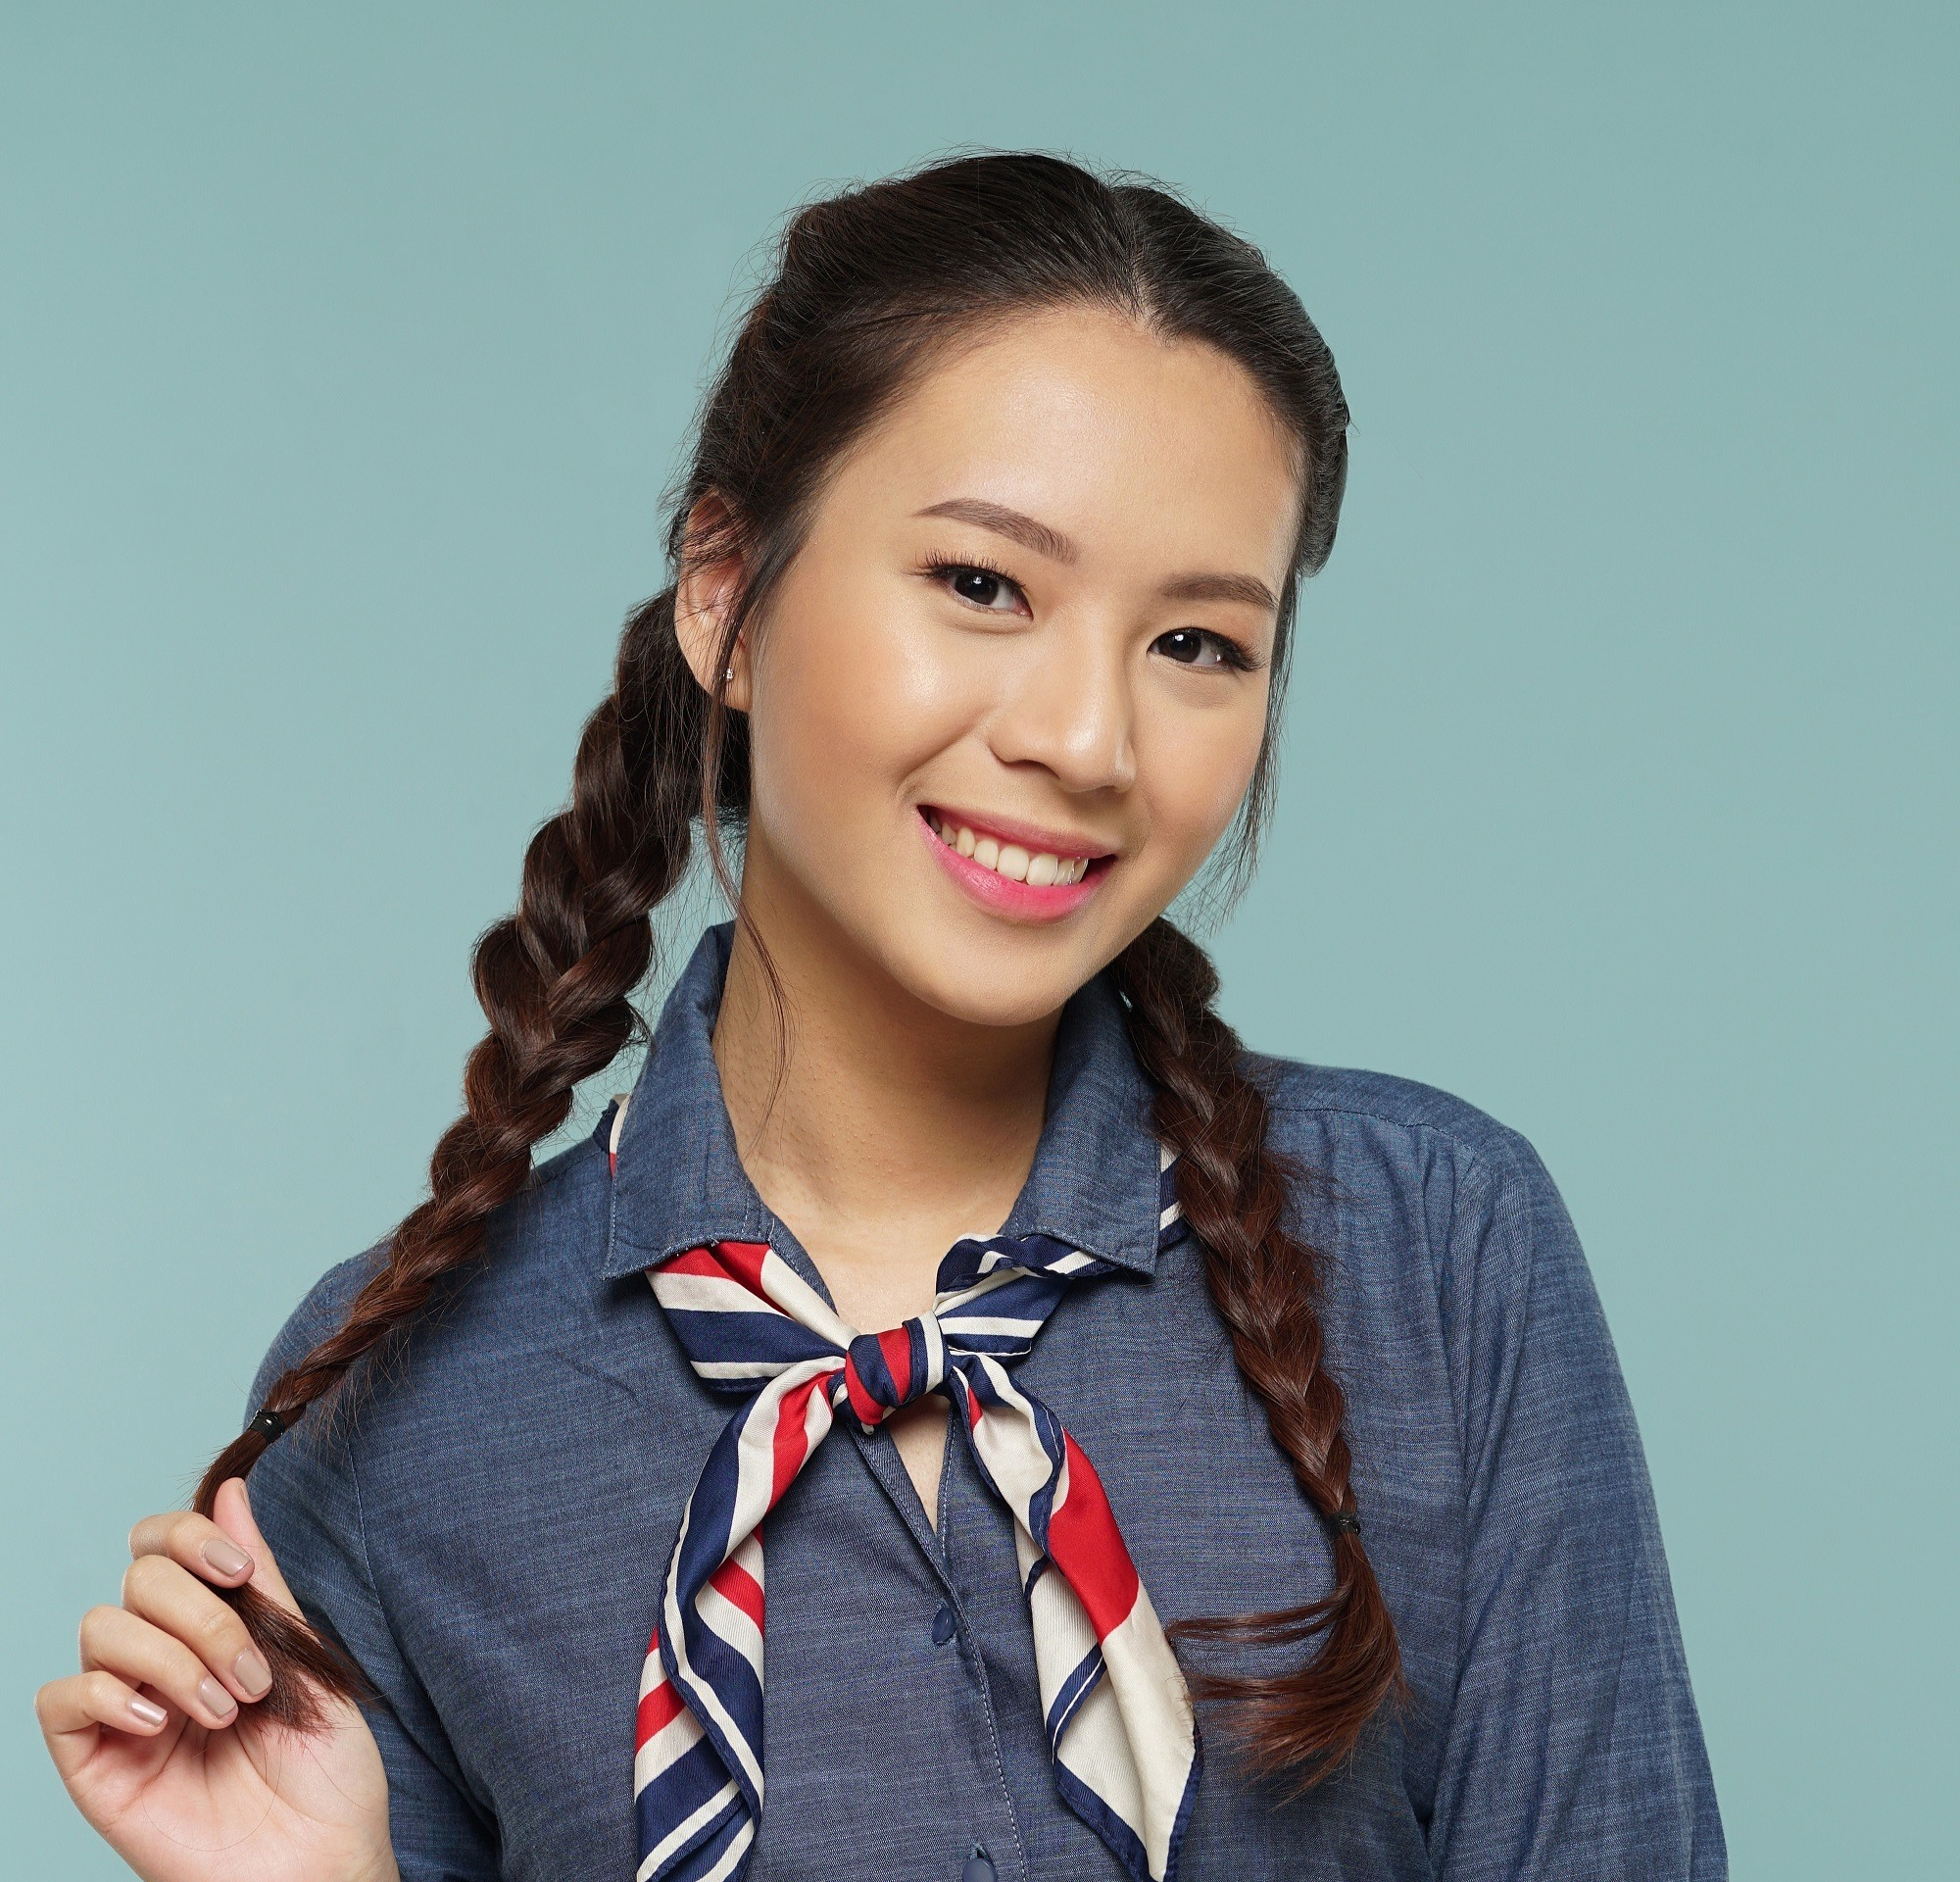 Dutch braid: Closeup shot of an Asian woman with long dark hair in messy two braids wearing a denim dress